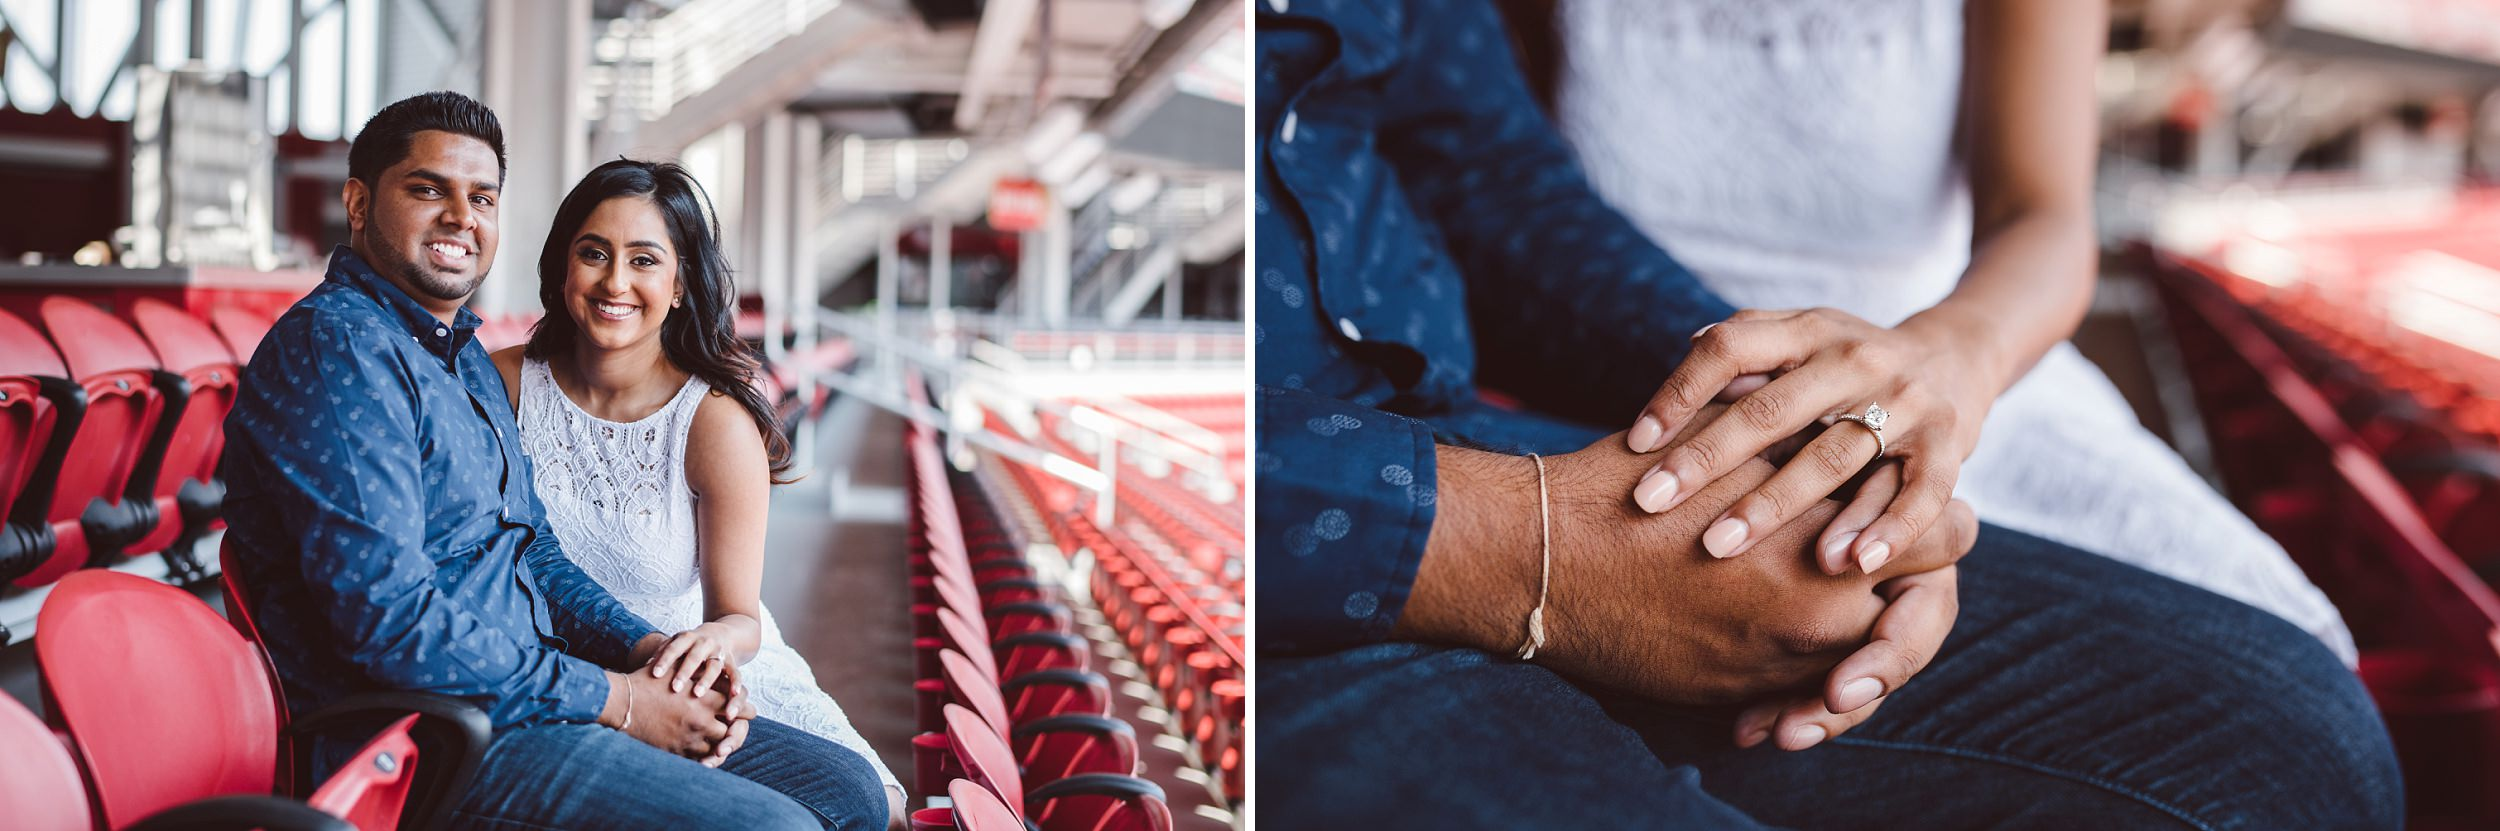 San-Francisco-49ers-Levis-Stadium-Engagement-Photography-004.jpg